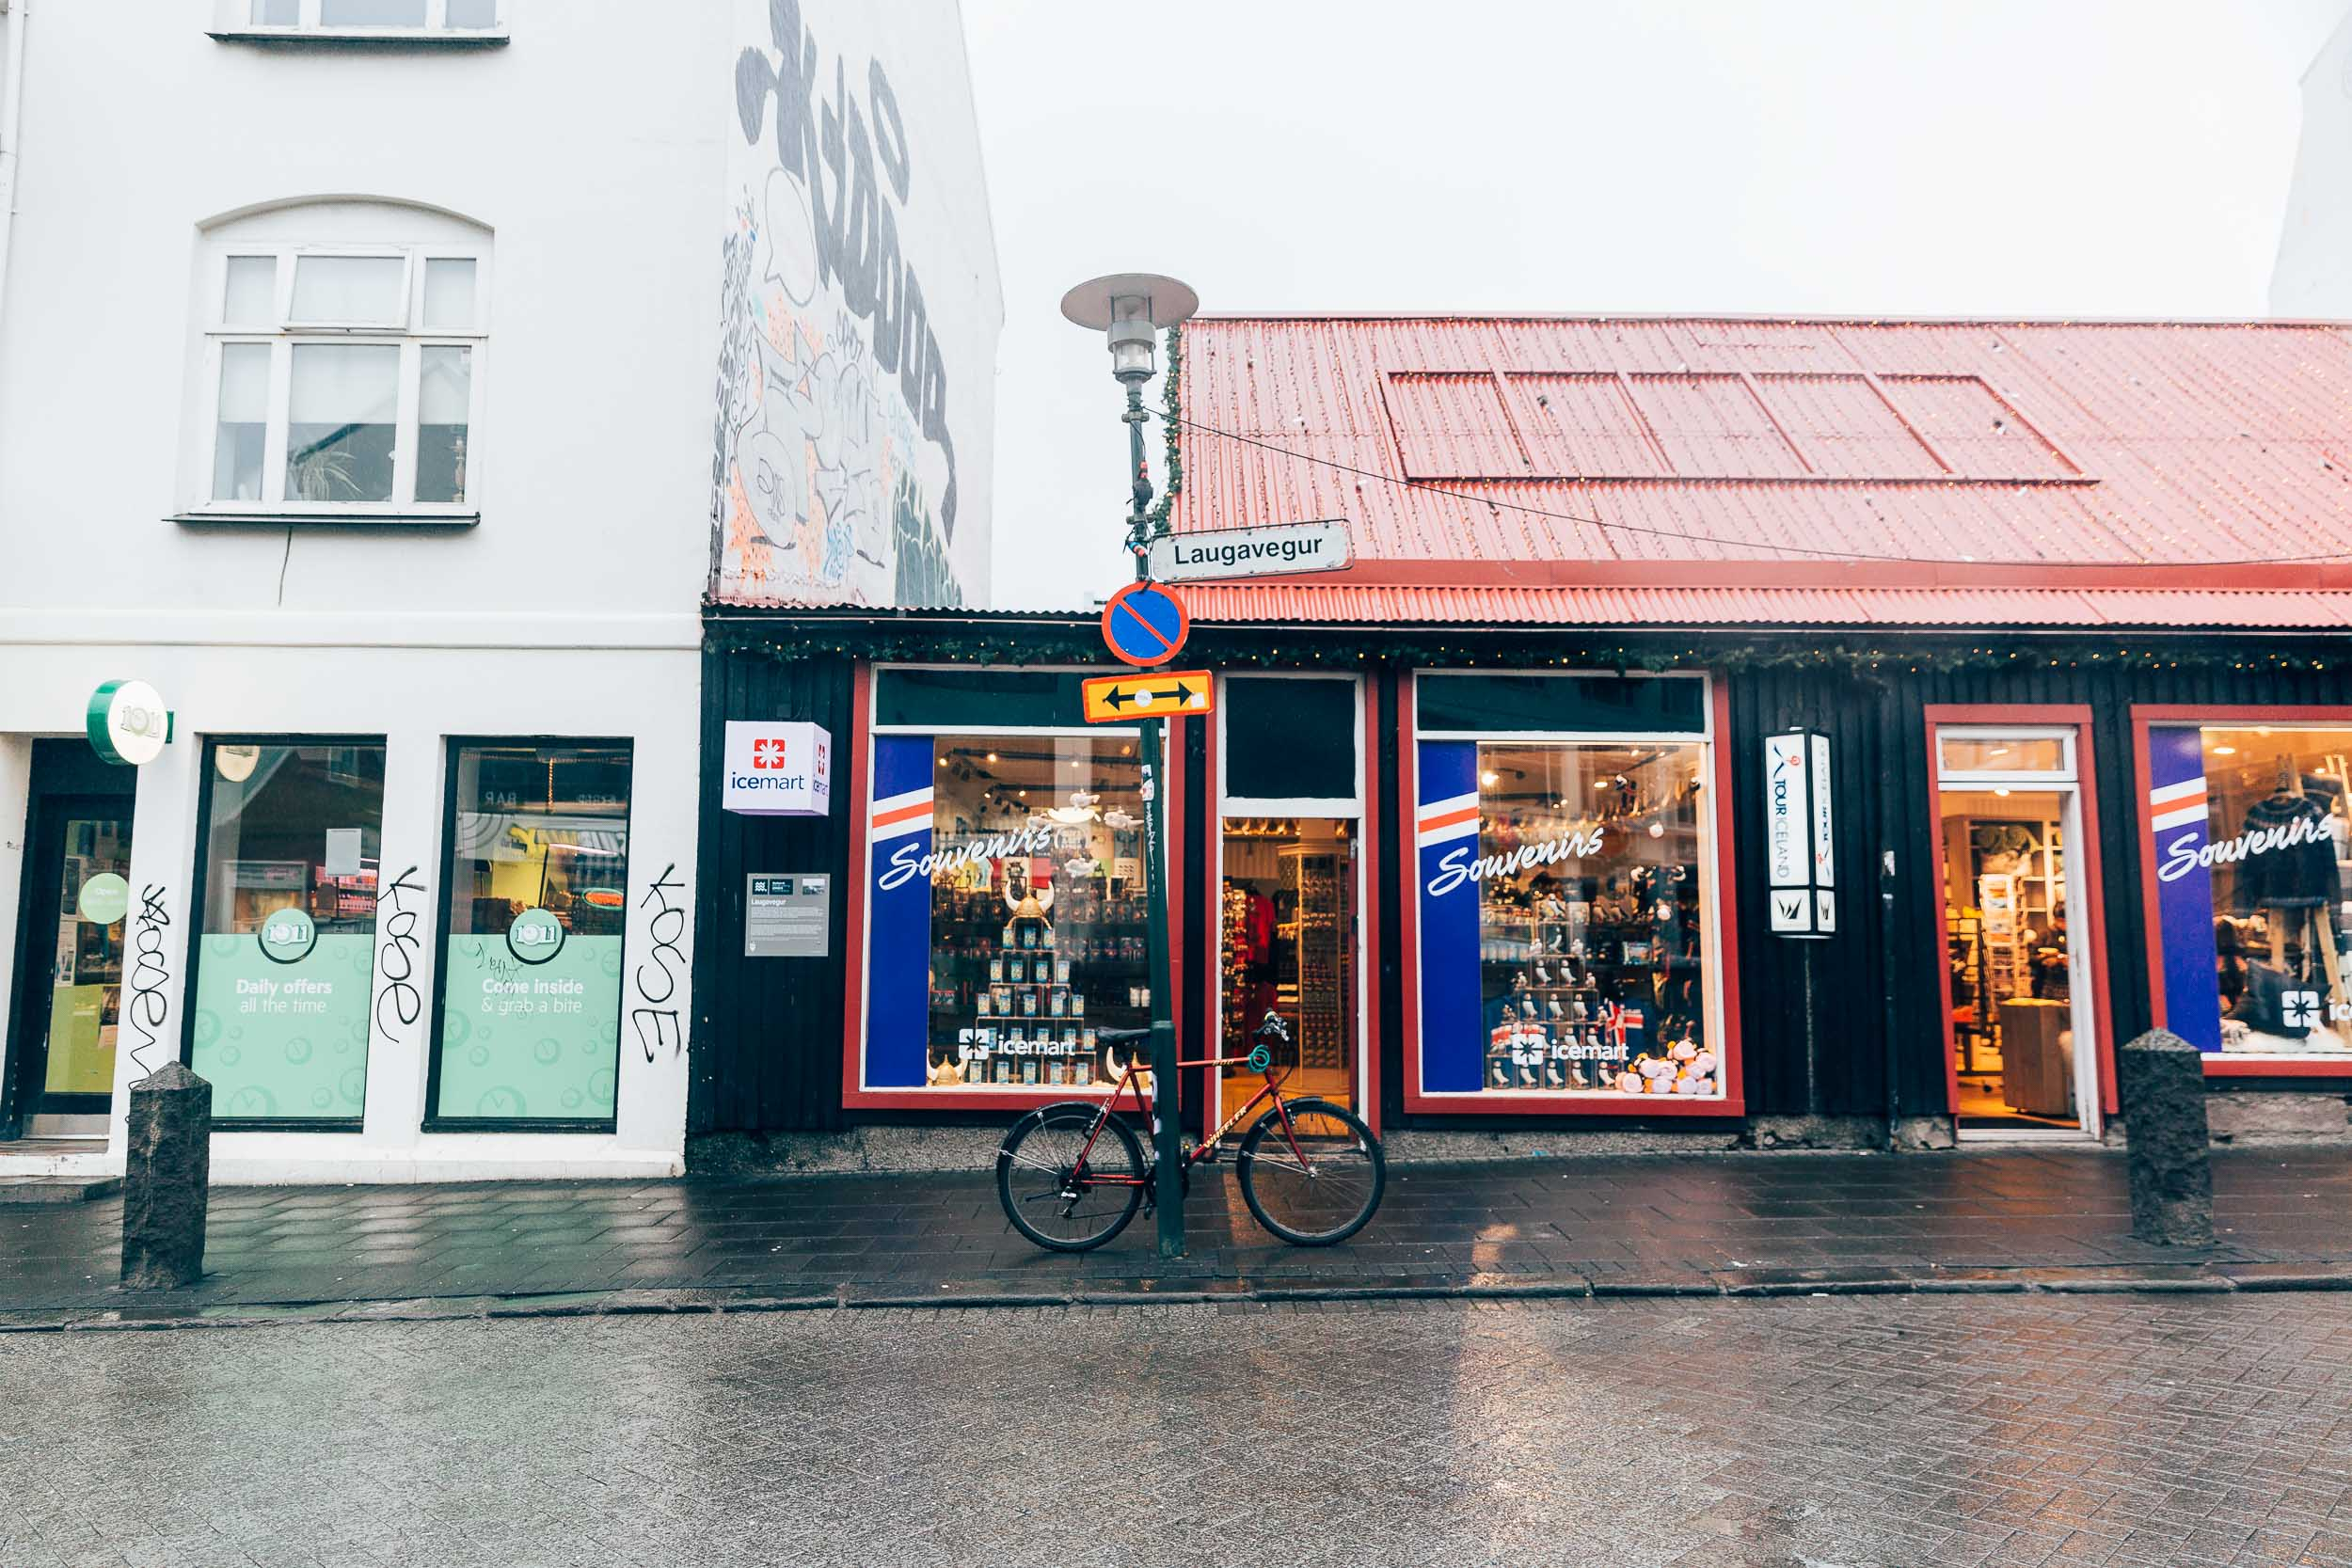 02_2019_Iceland-34.jpg